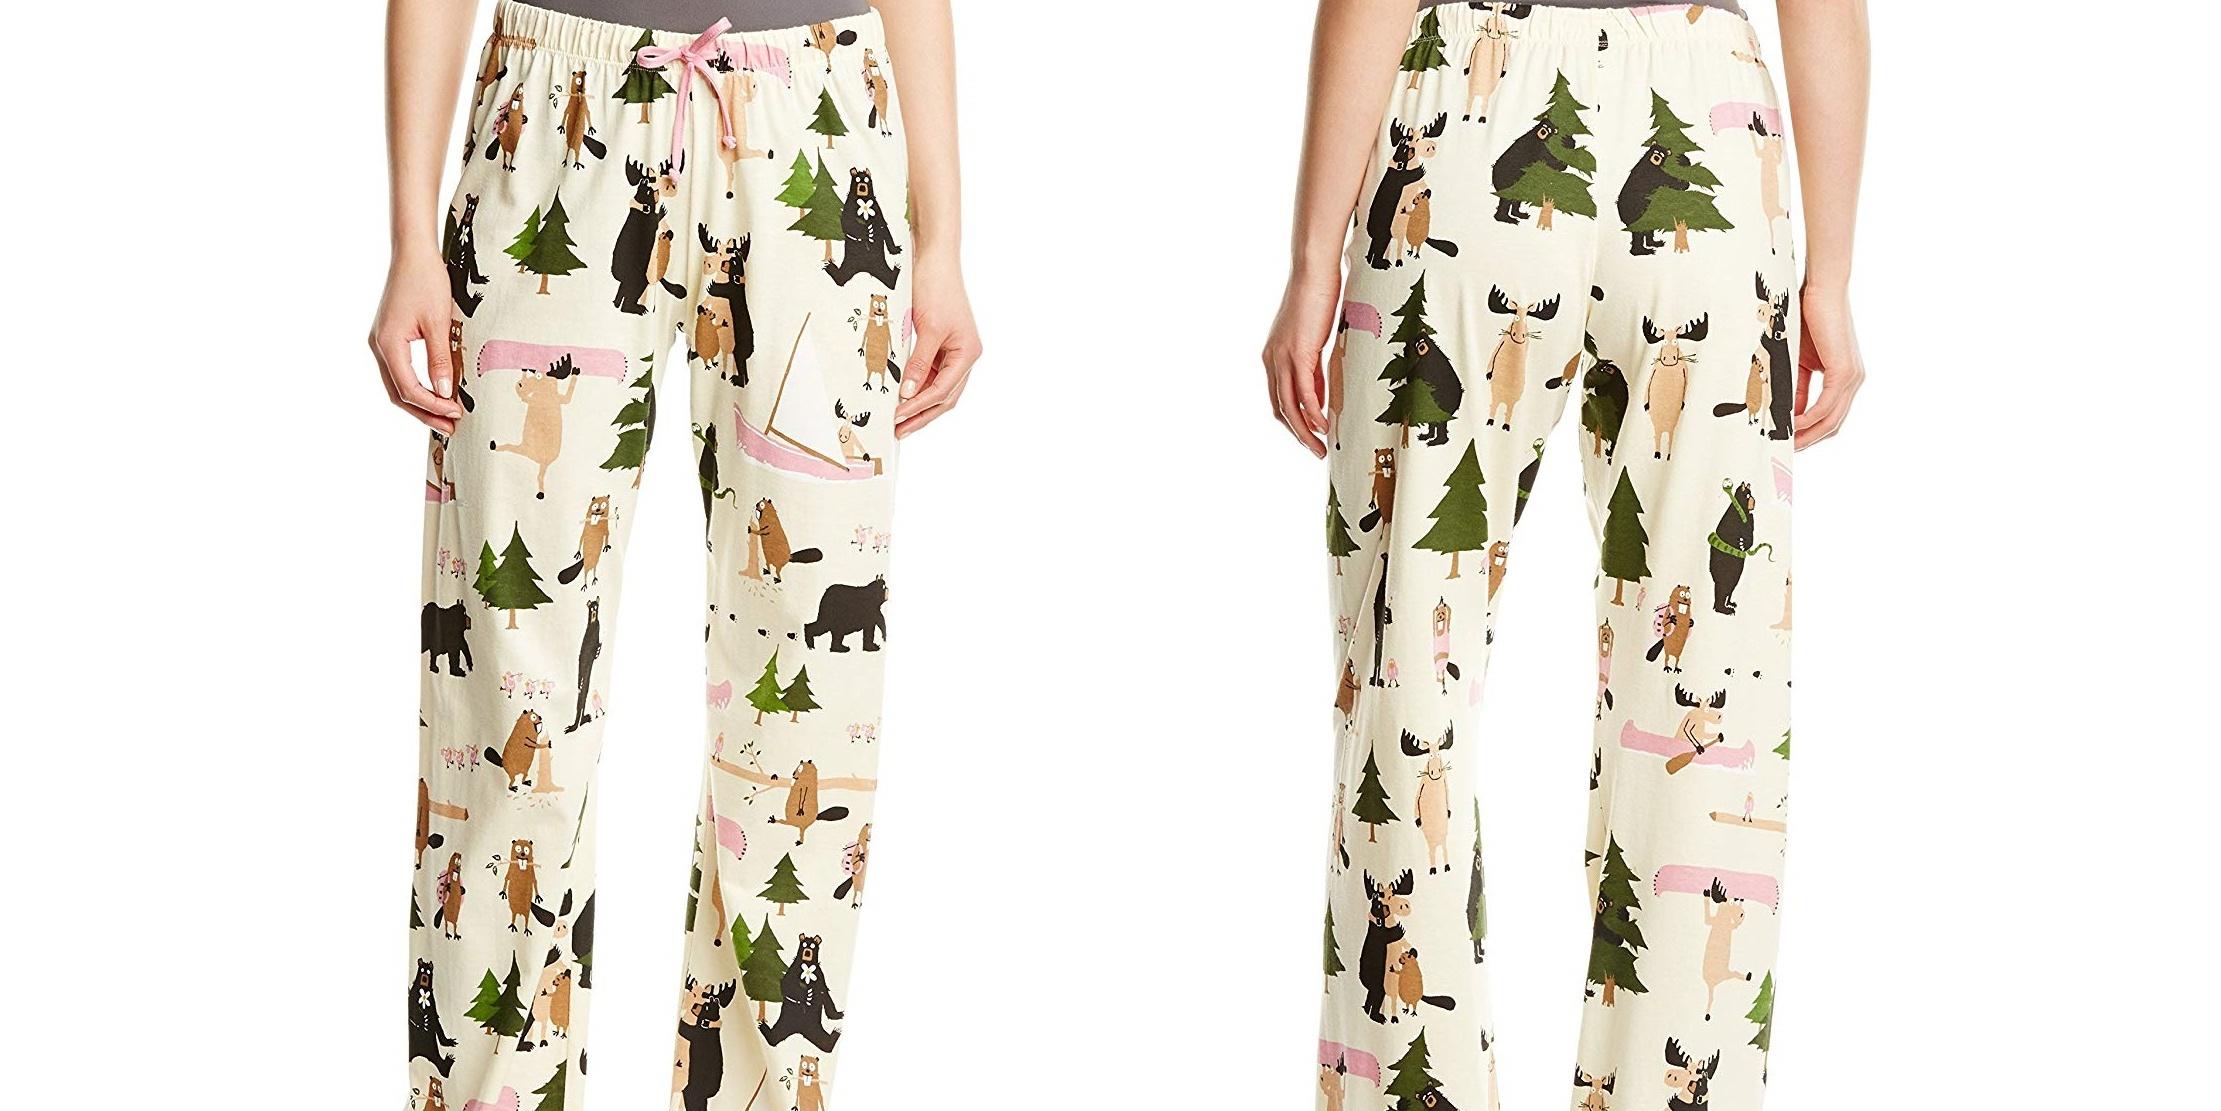 hatley-organic-cotton-pyjamas-animal-print